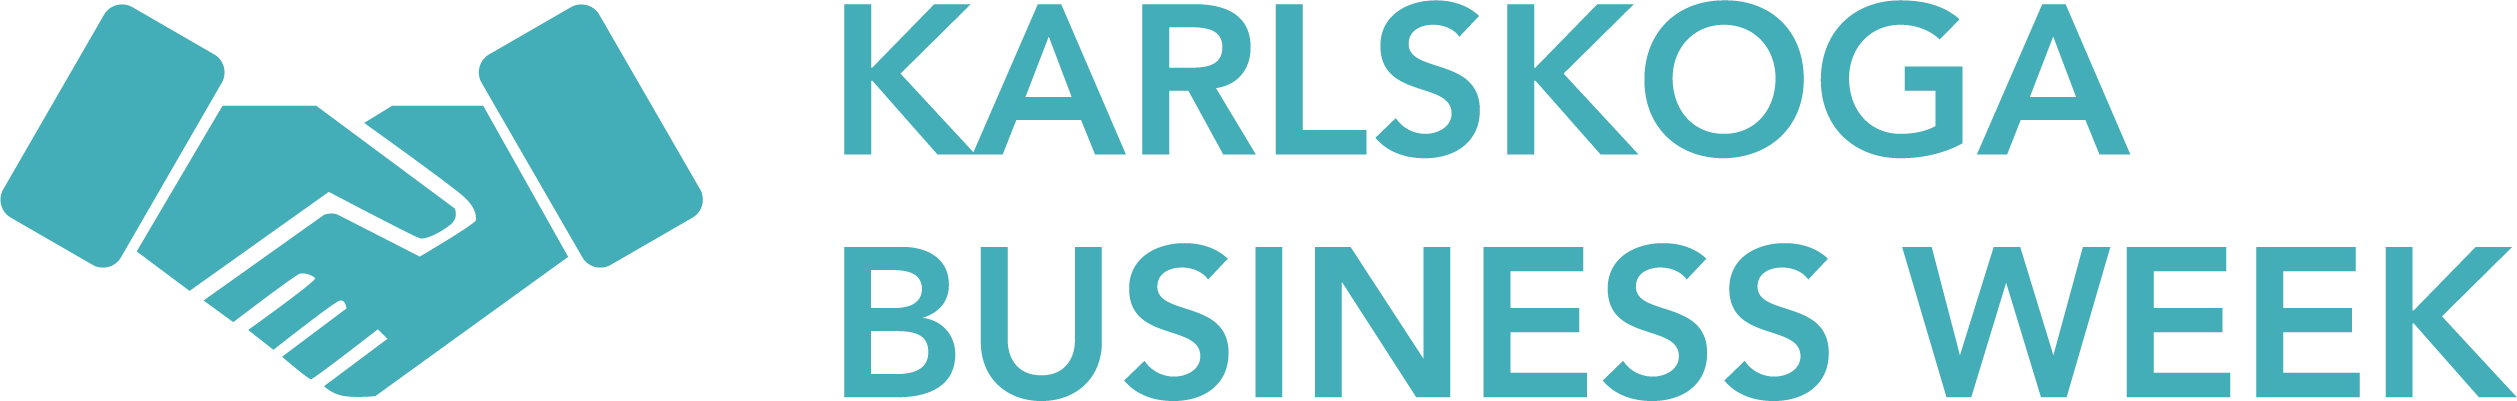 Karlskoga Business Week